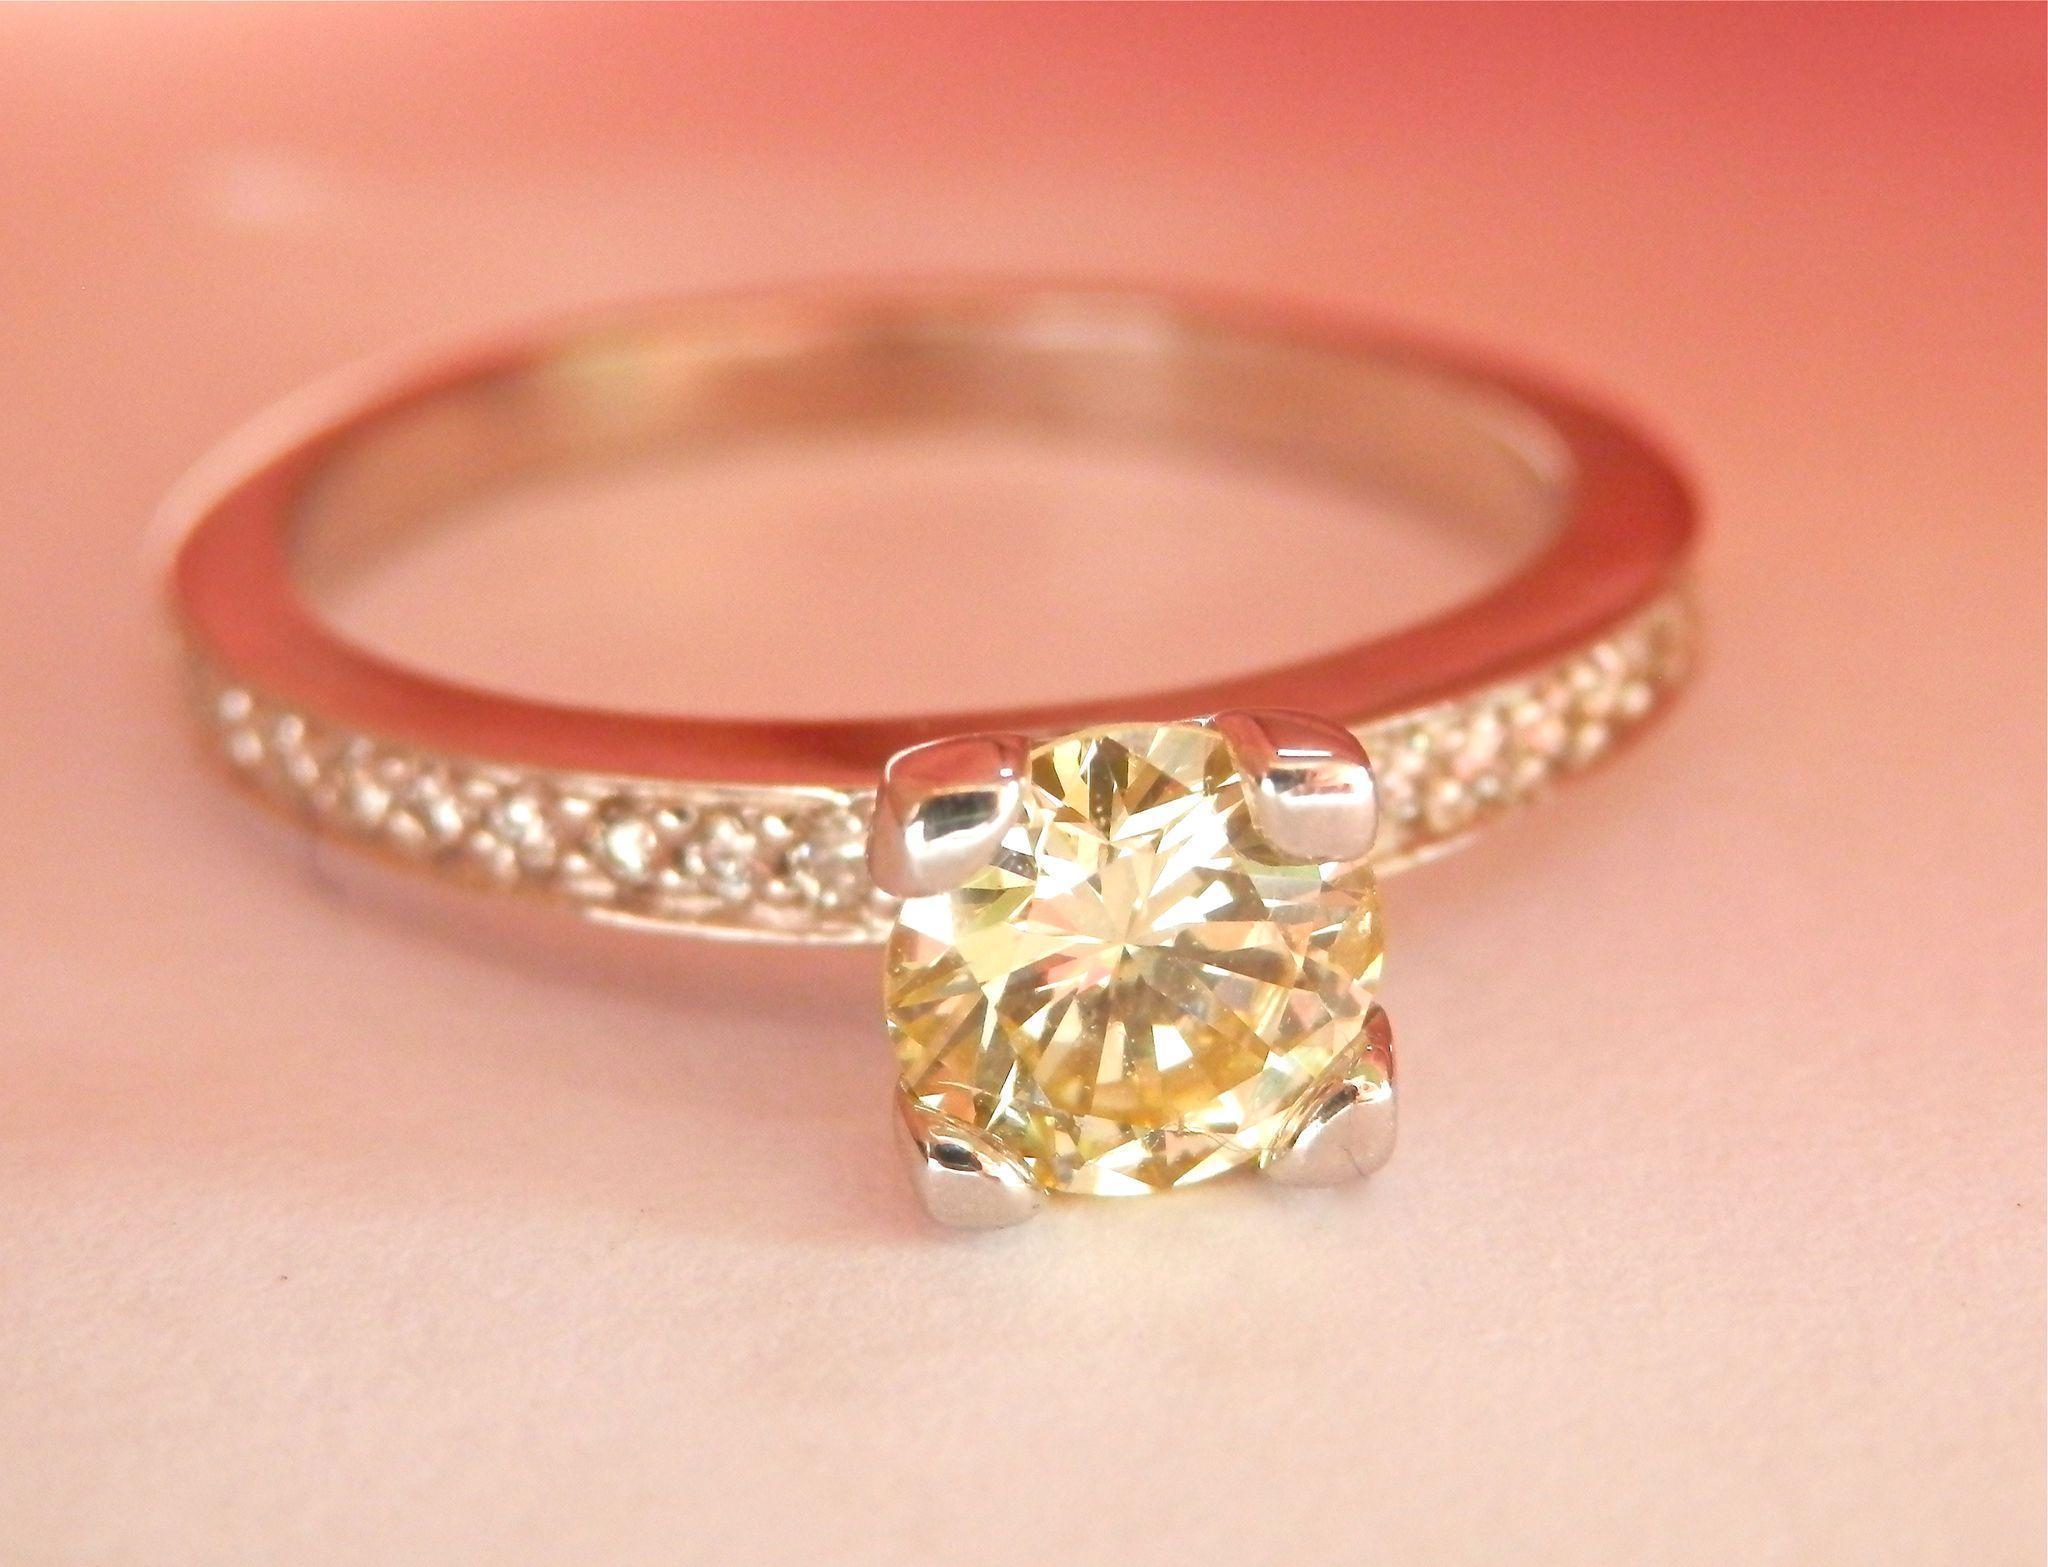 FINAL MARKDOWN! Wonderful 14K W/Gold 0.55 ct. Fancy Light Yellow Natural Diamond Ring GIA